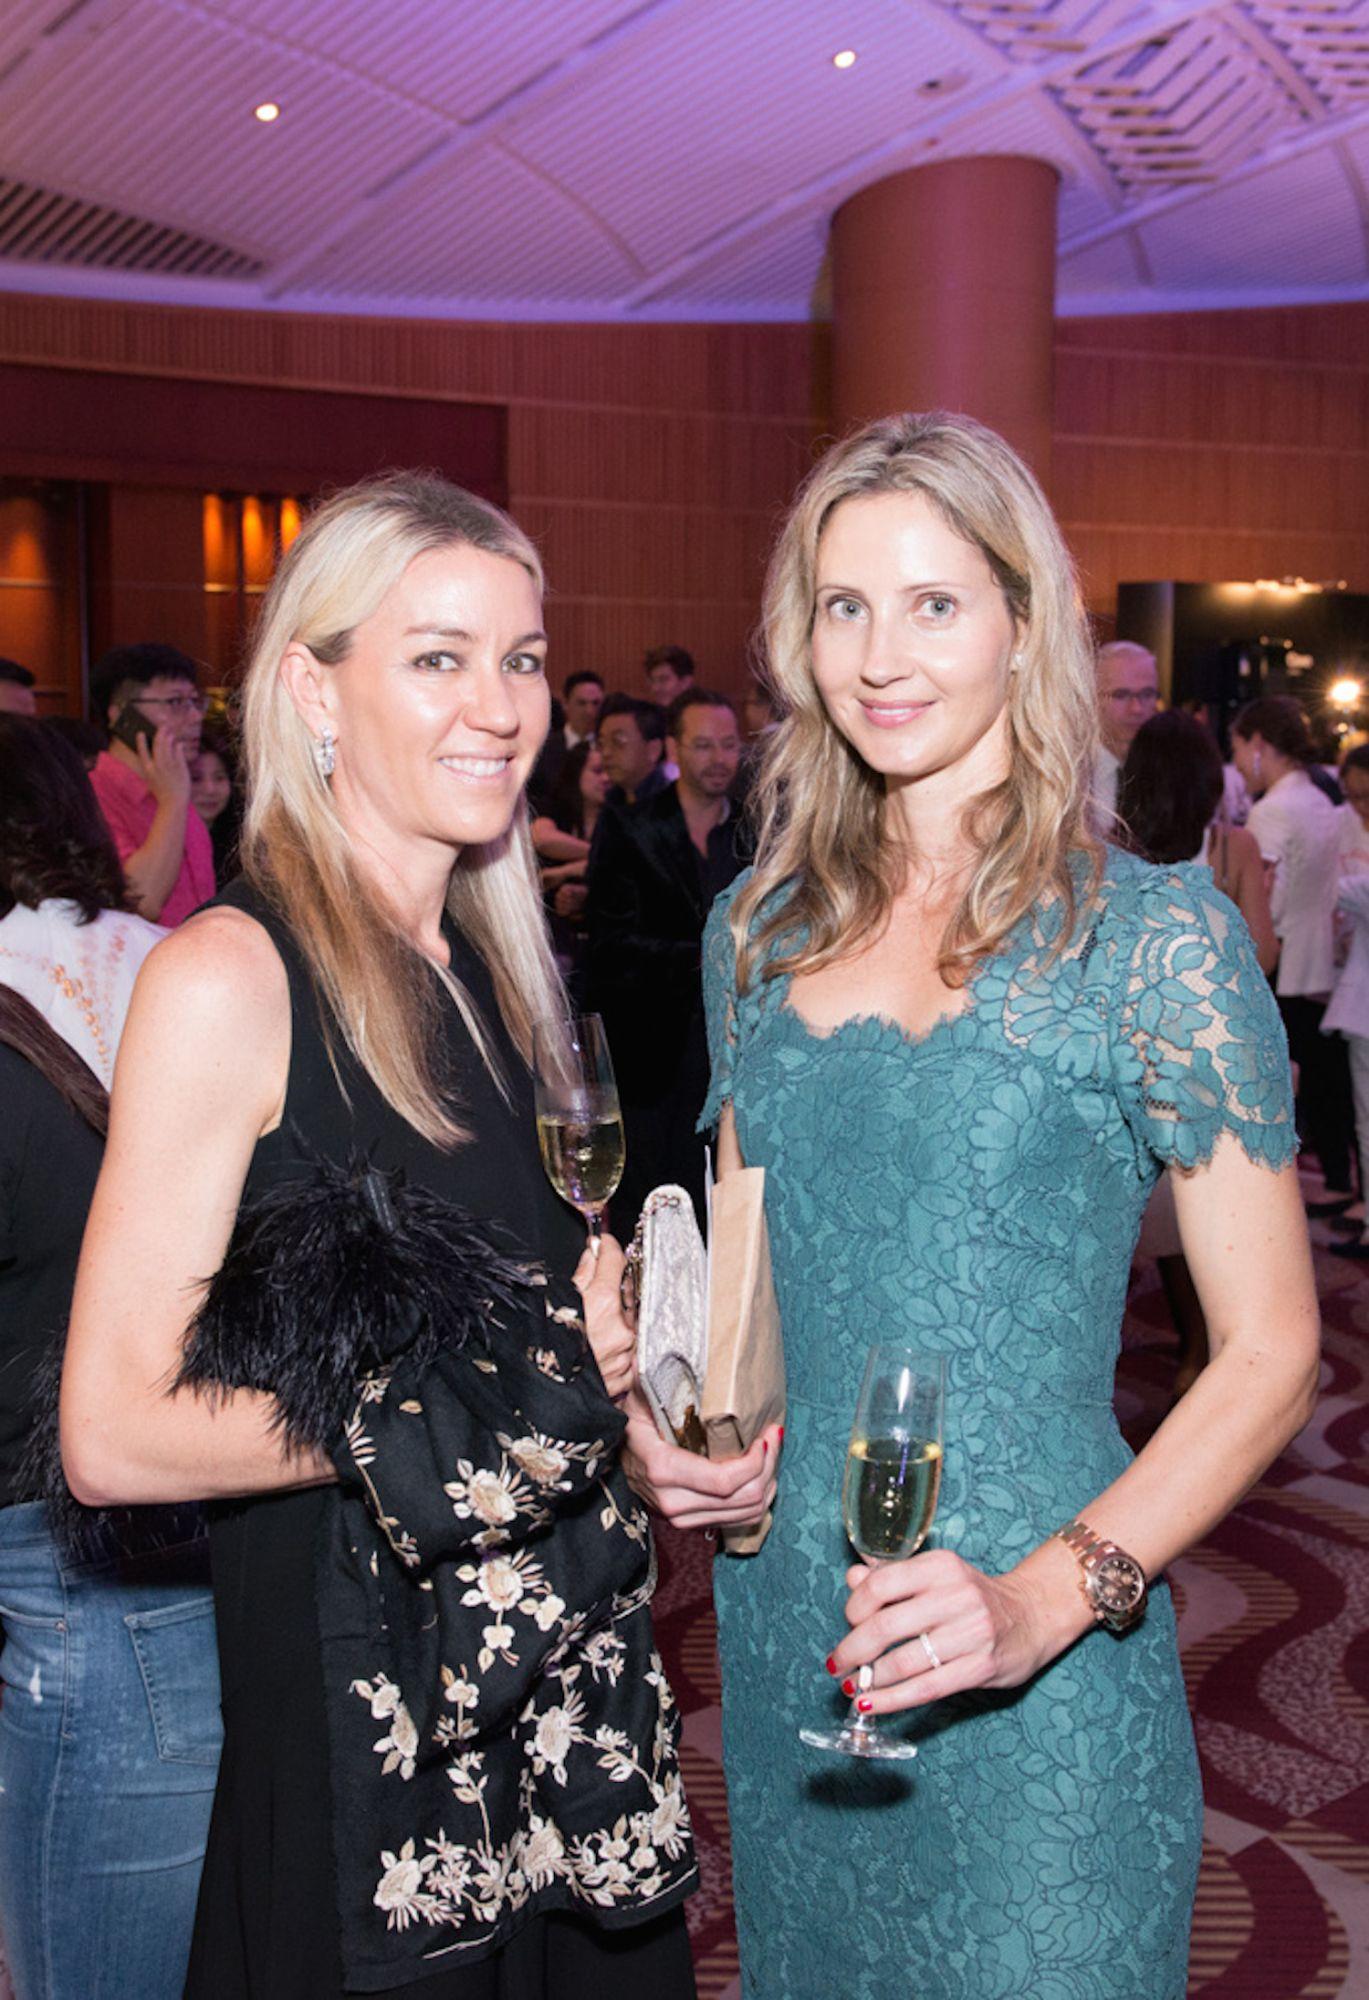 Lucy Bond-Marriott and Tamara Varga